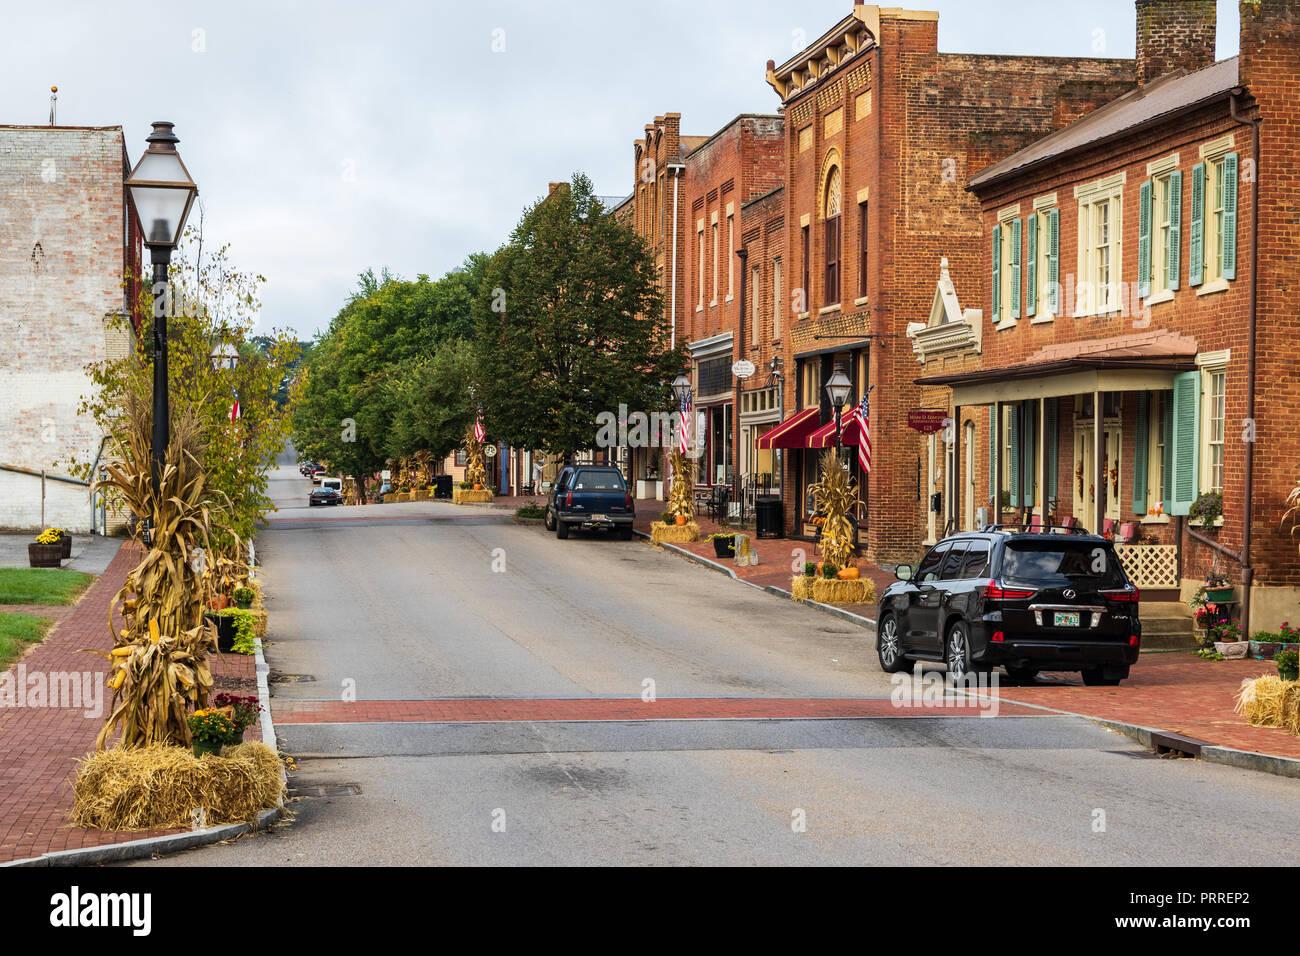 JONESBOROUGH, TN, USA-9/29/18:  Colorful Thanksgiving displays with cornstalks, chrysanthemums, pumpkins, and hay bales line main street. Stock Photo